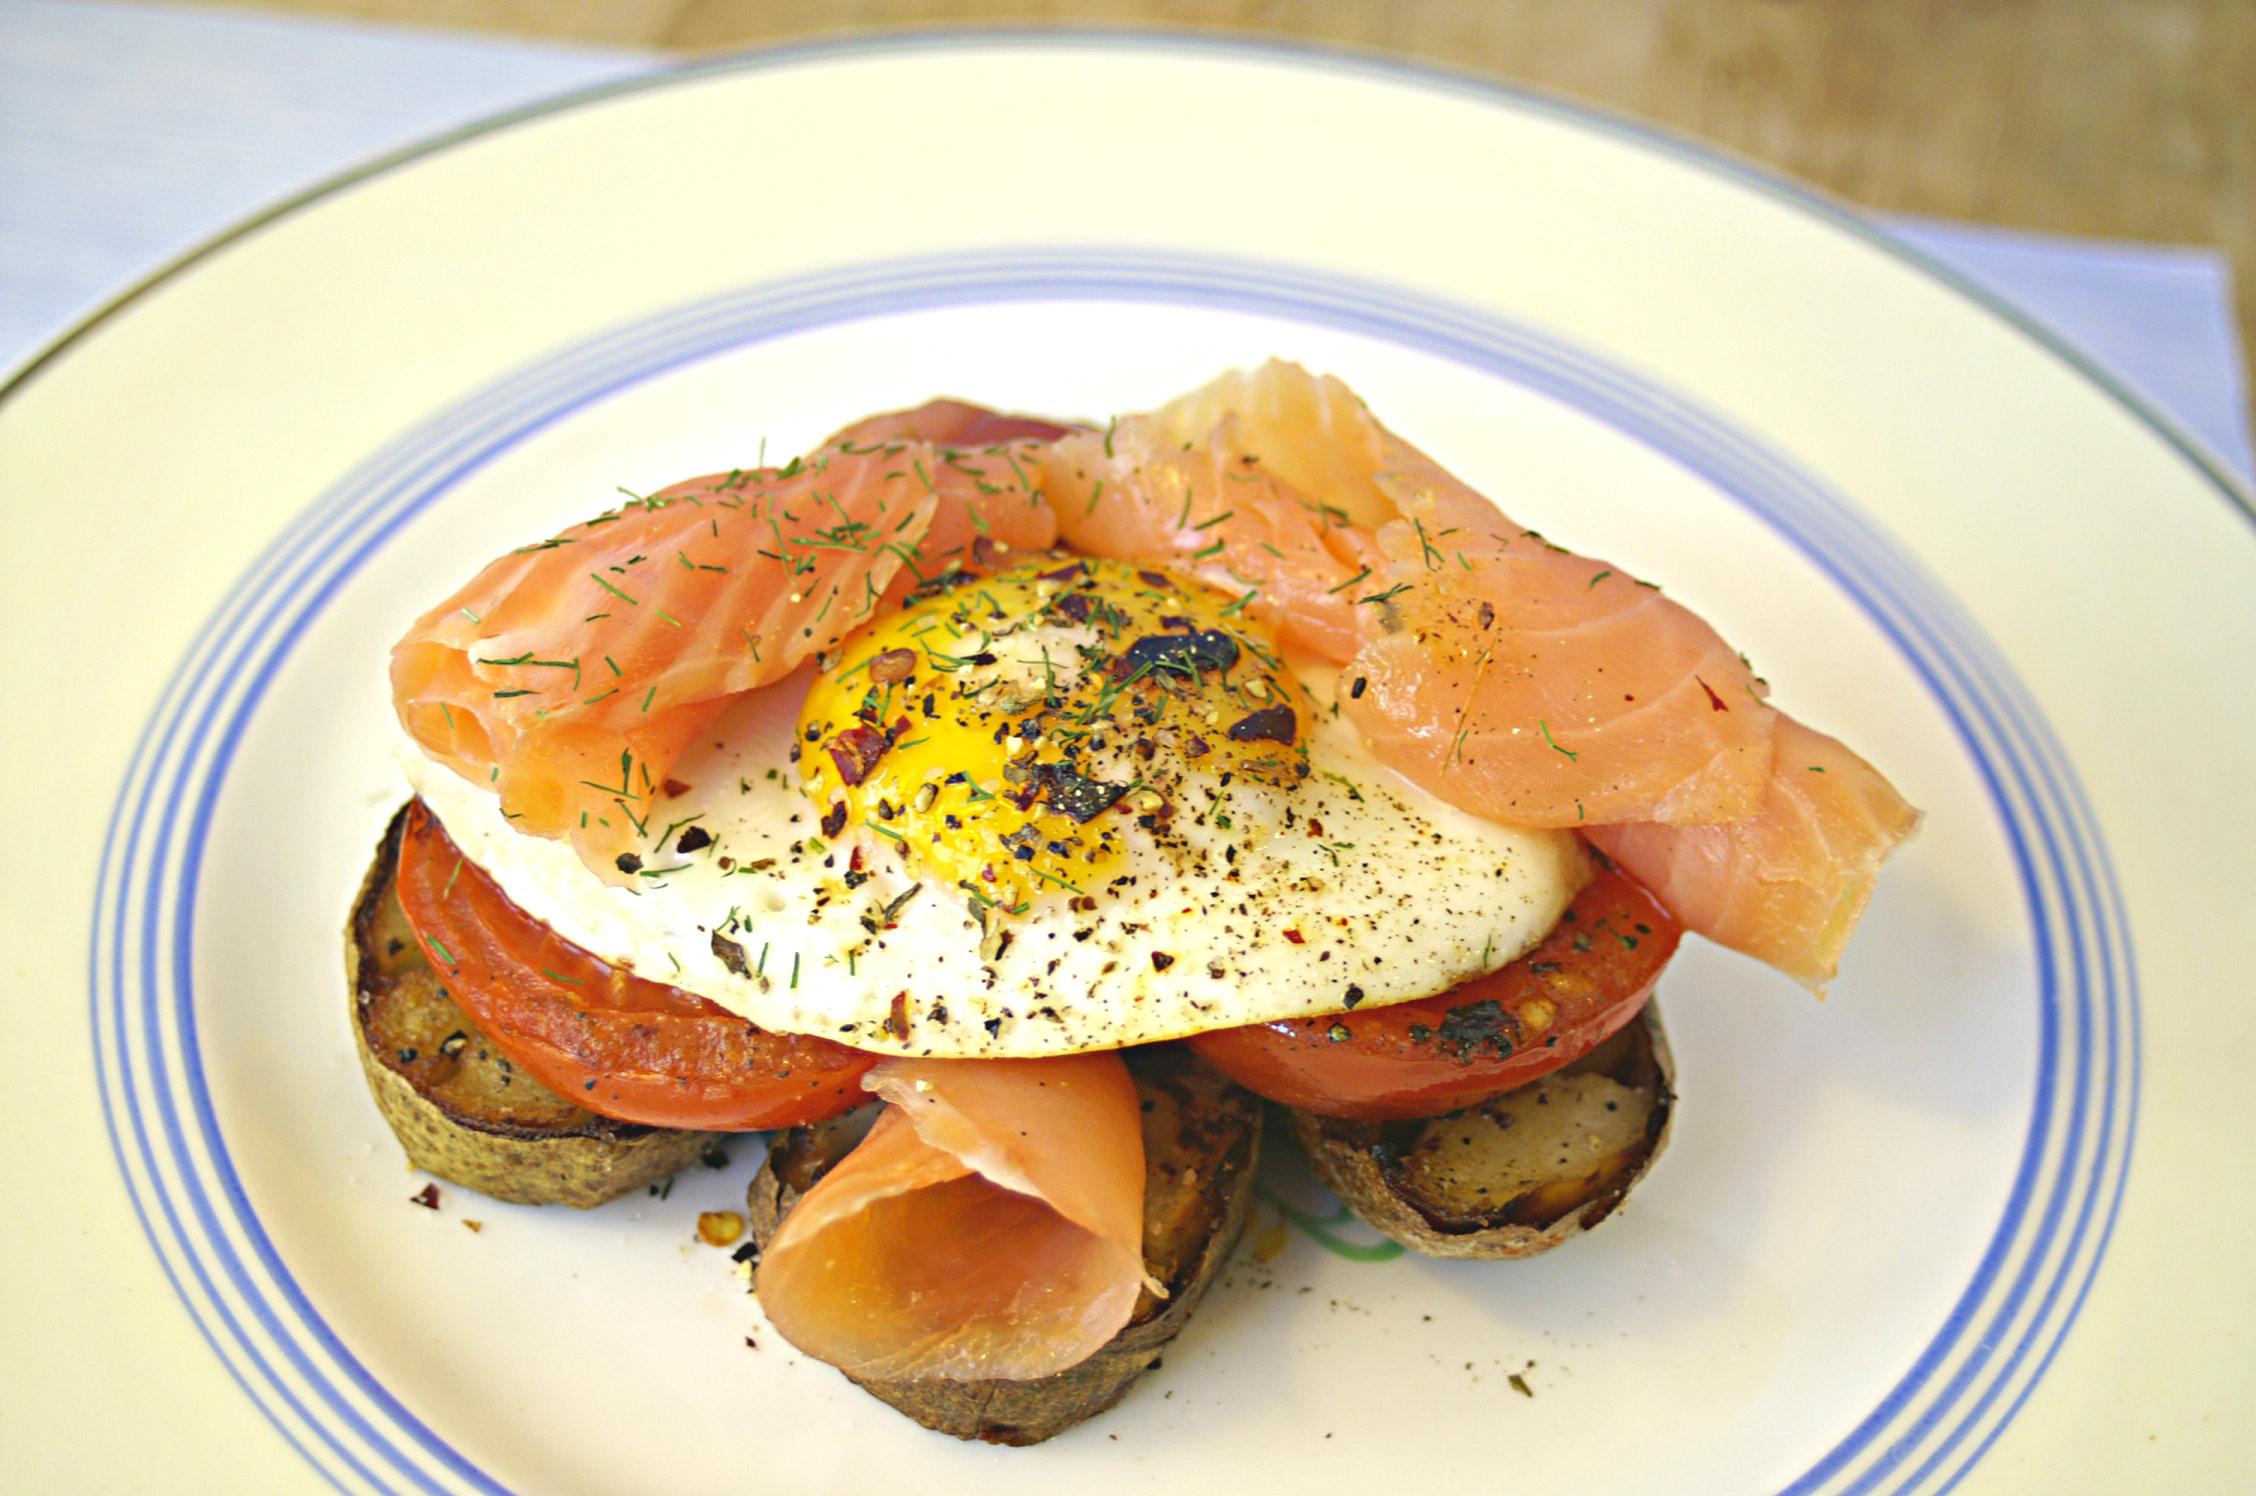 Salmon For Breakfast Healthy  salmon and eggs breakfast healthy